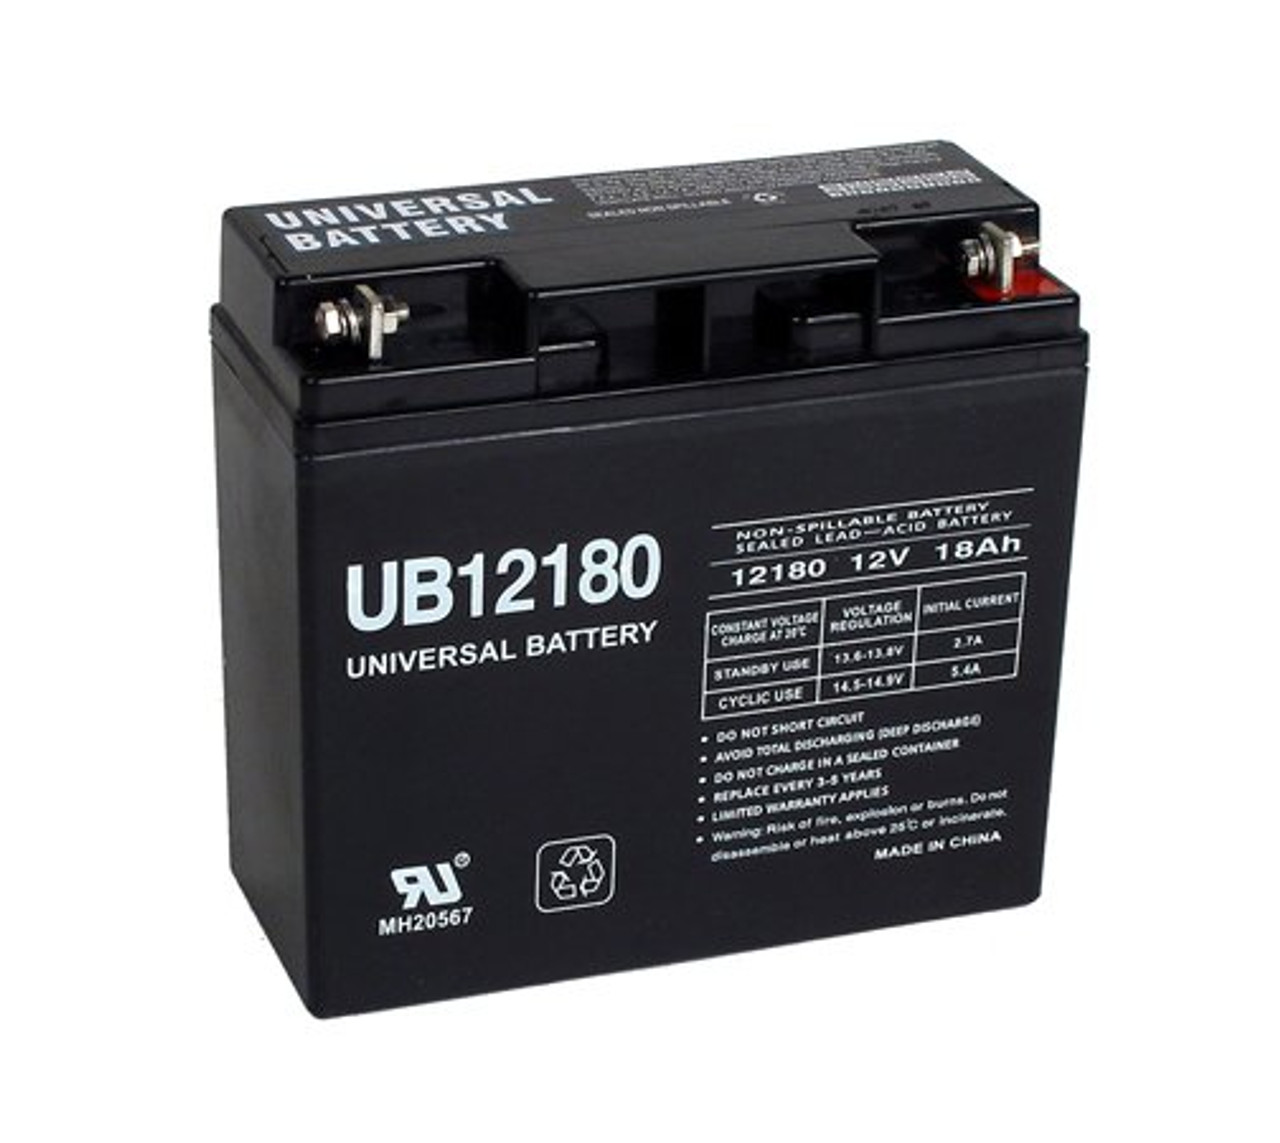 12v 18ah Battery >> 12v 18ah Cb19 12 Sealed Lead Acid Agm Rechargeable Deep Cycle Battery